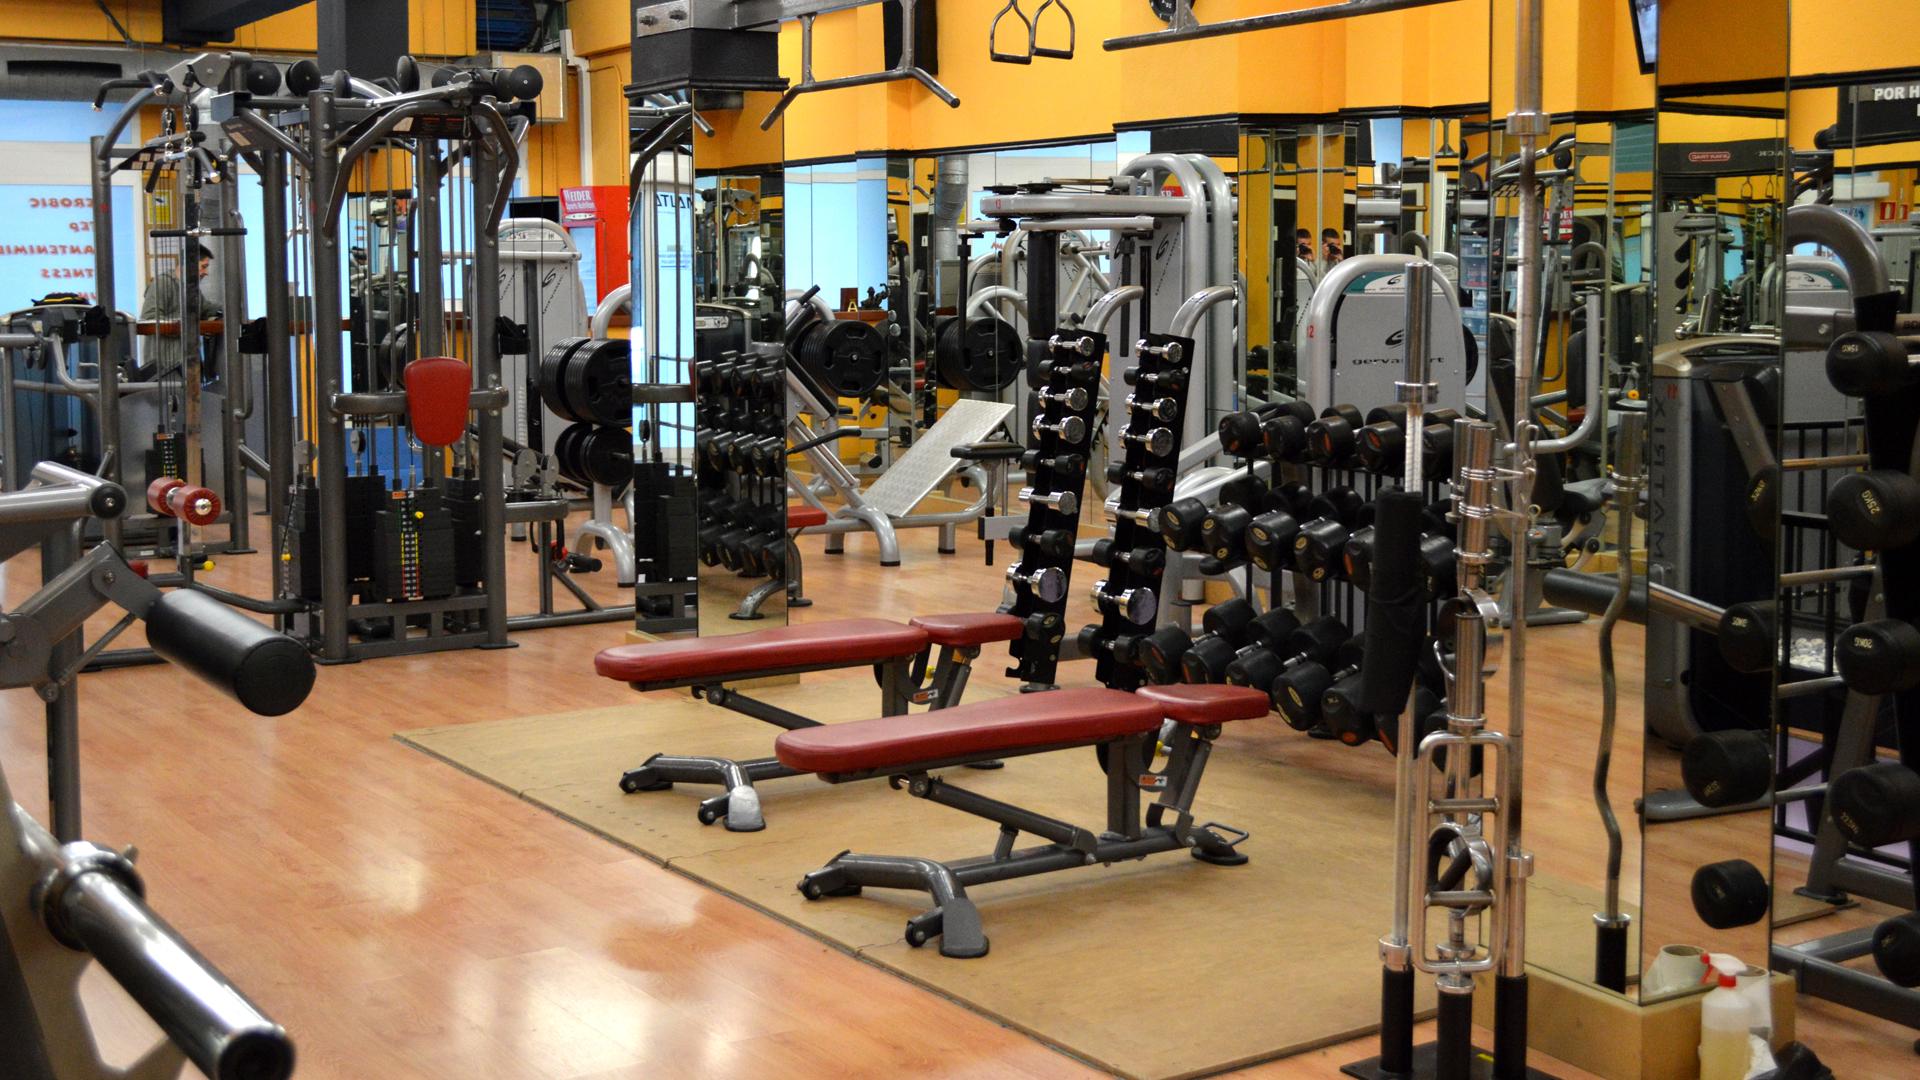 Gym atlanta studio gimnasio palma de mallorca for Gimnasio fitness club